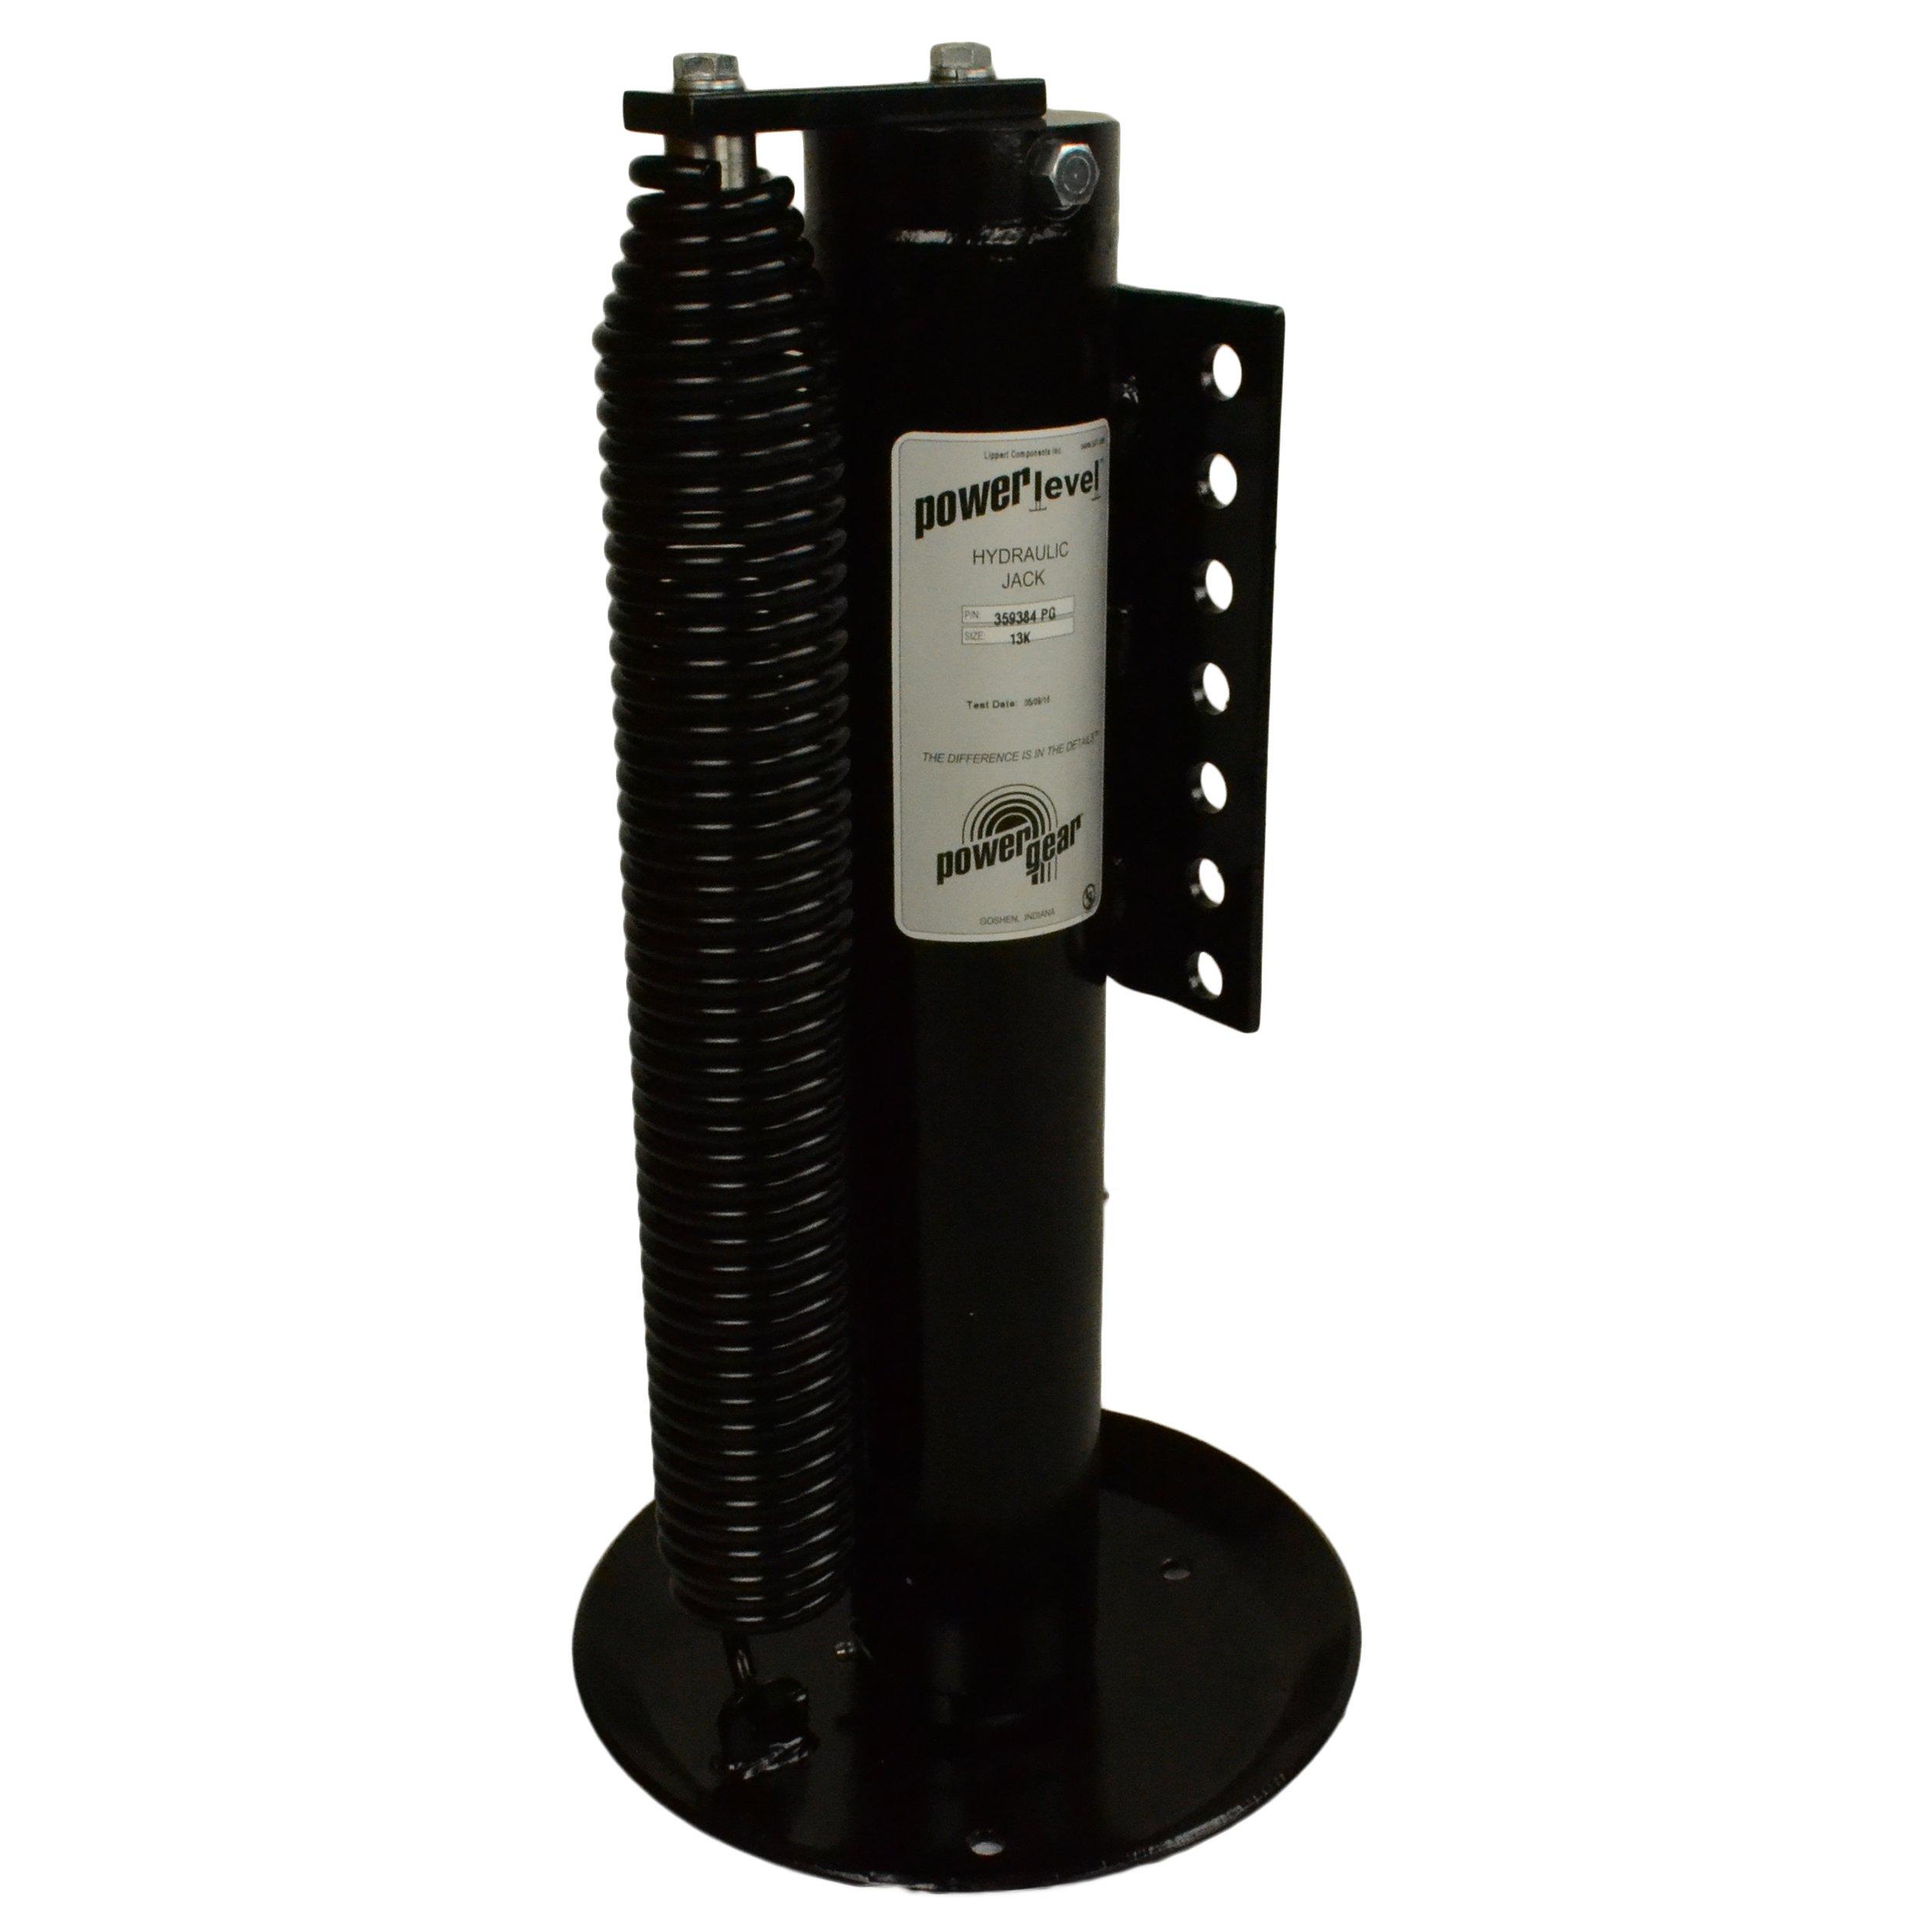 Lippert Components/Power Gear 359384/500800 Leveling Jack - 13,000 LB.